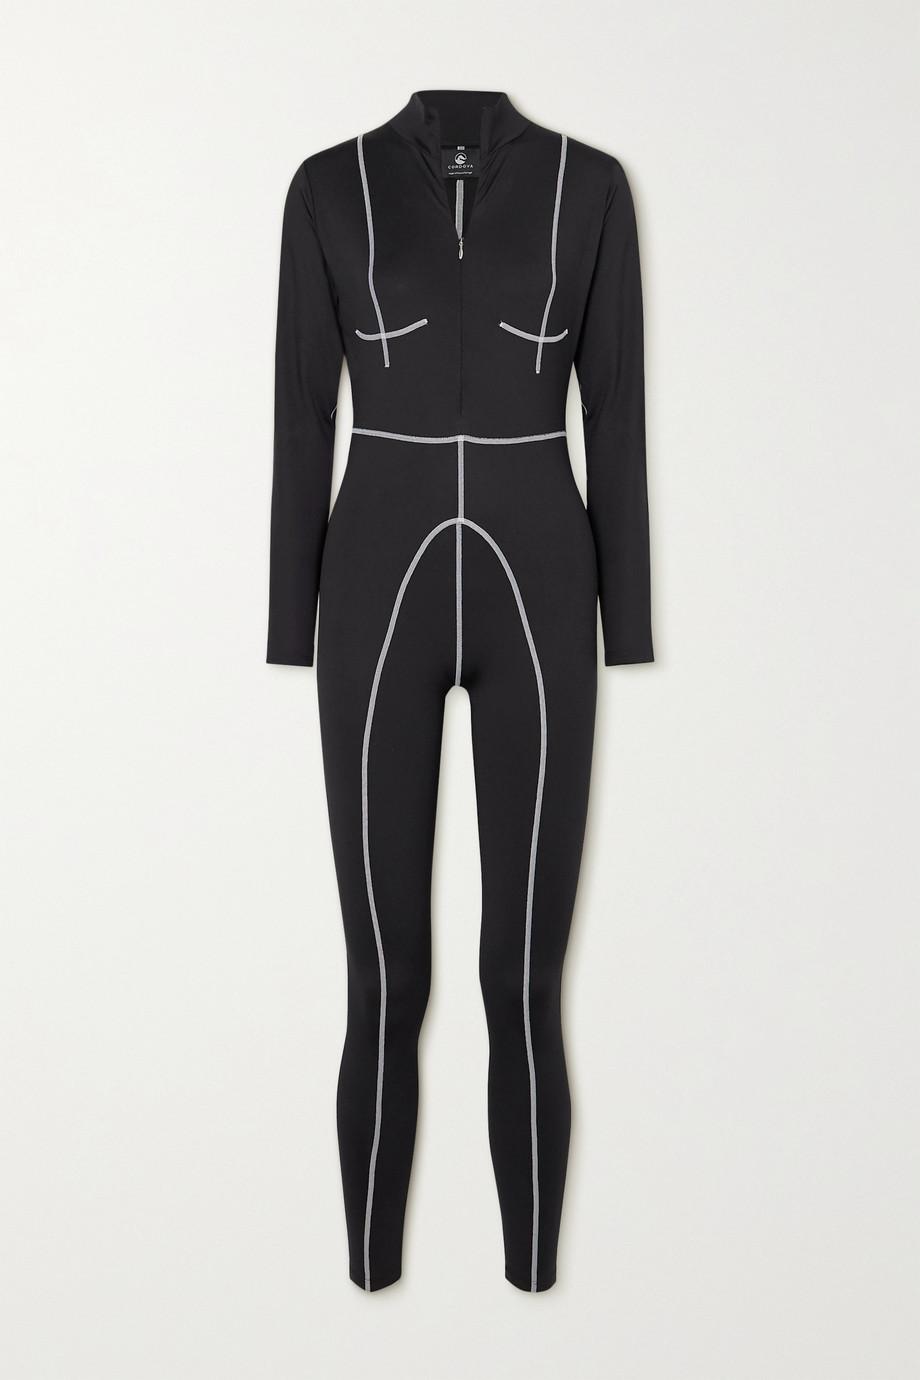 Cordova Dolomite ski suit